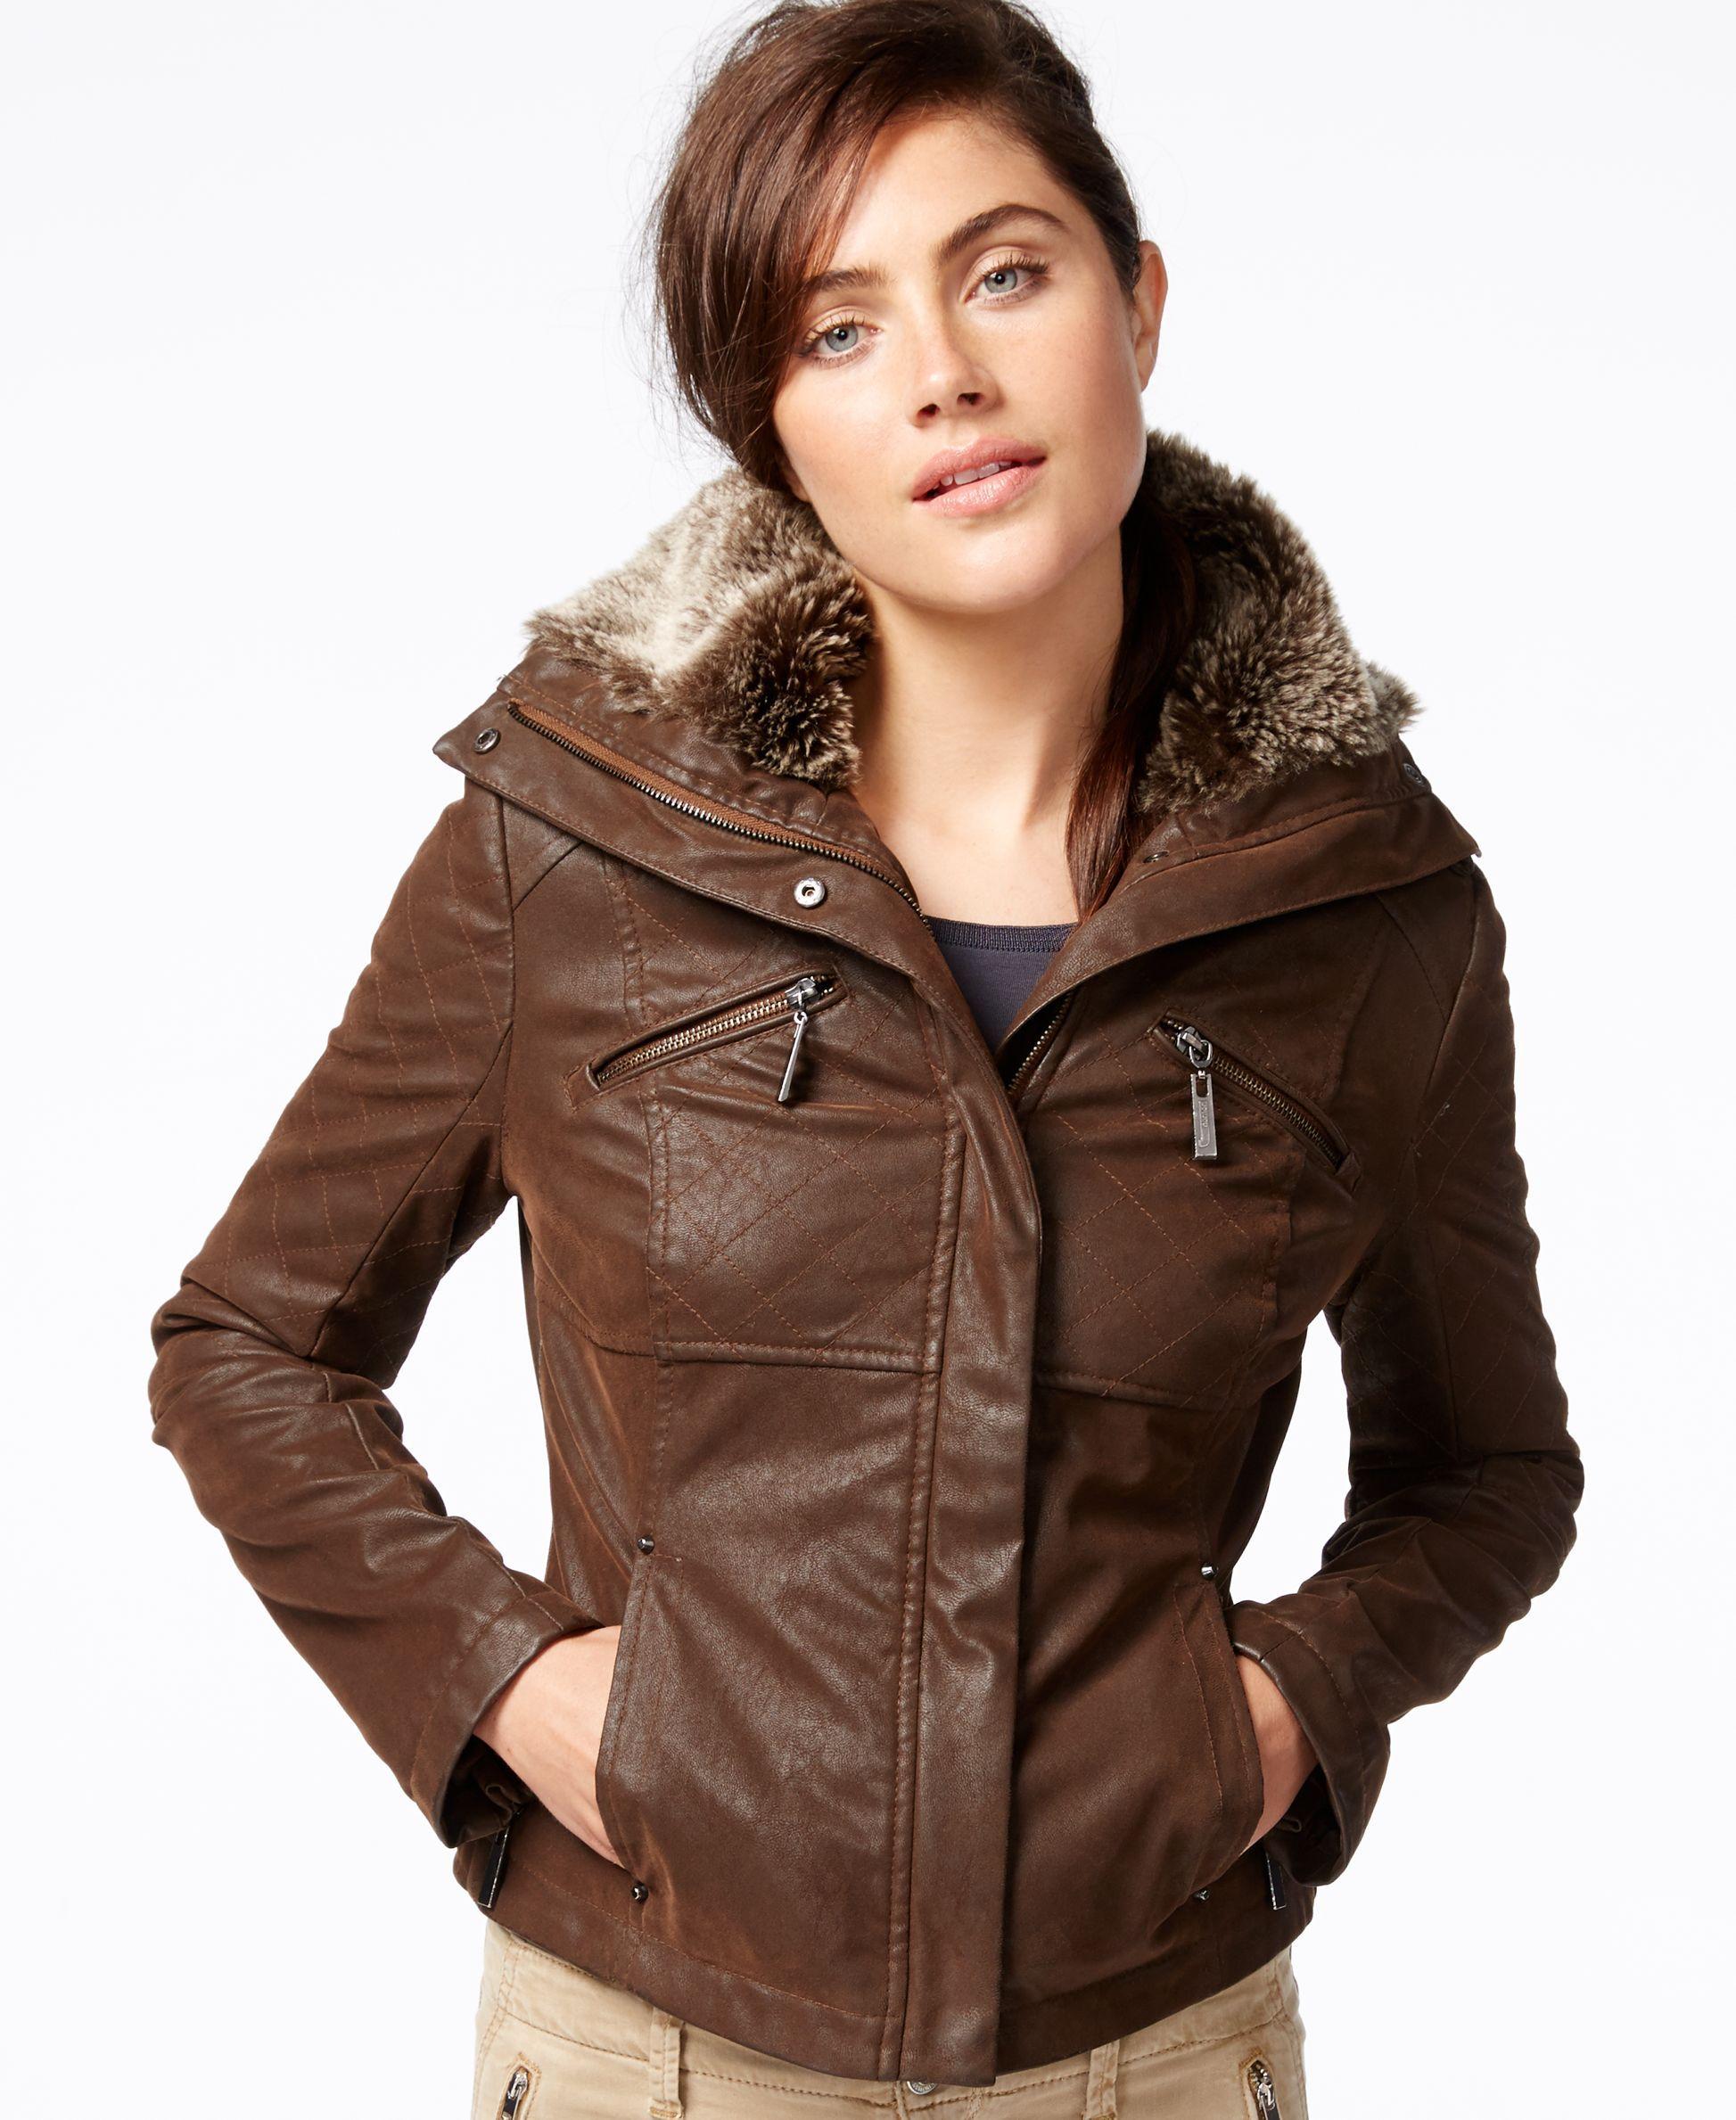 Jou Jou Faux Leather Bomber Jacket Coats Women Macy S Faux Leather Bomber Jacket Leather Jacket Style Leather Bomber Jacket